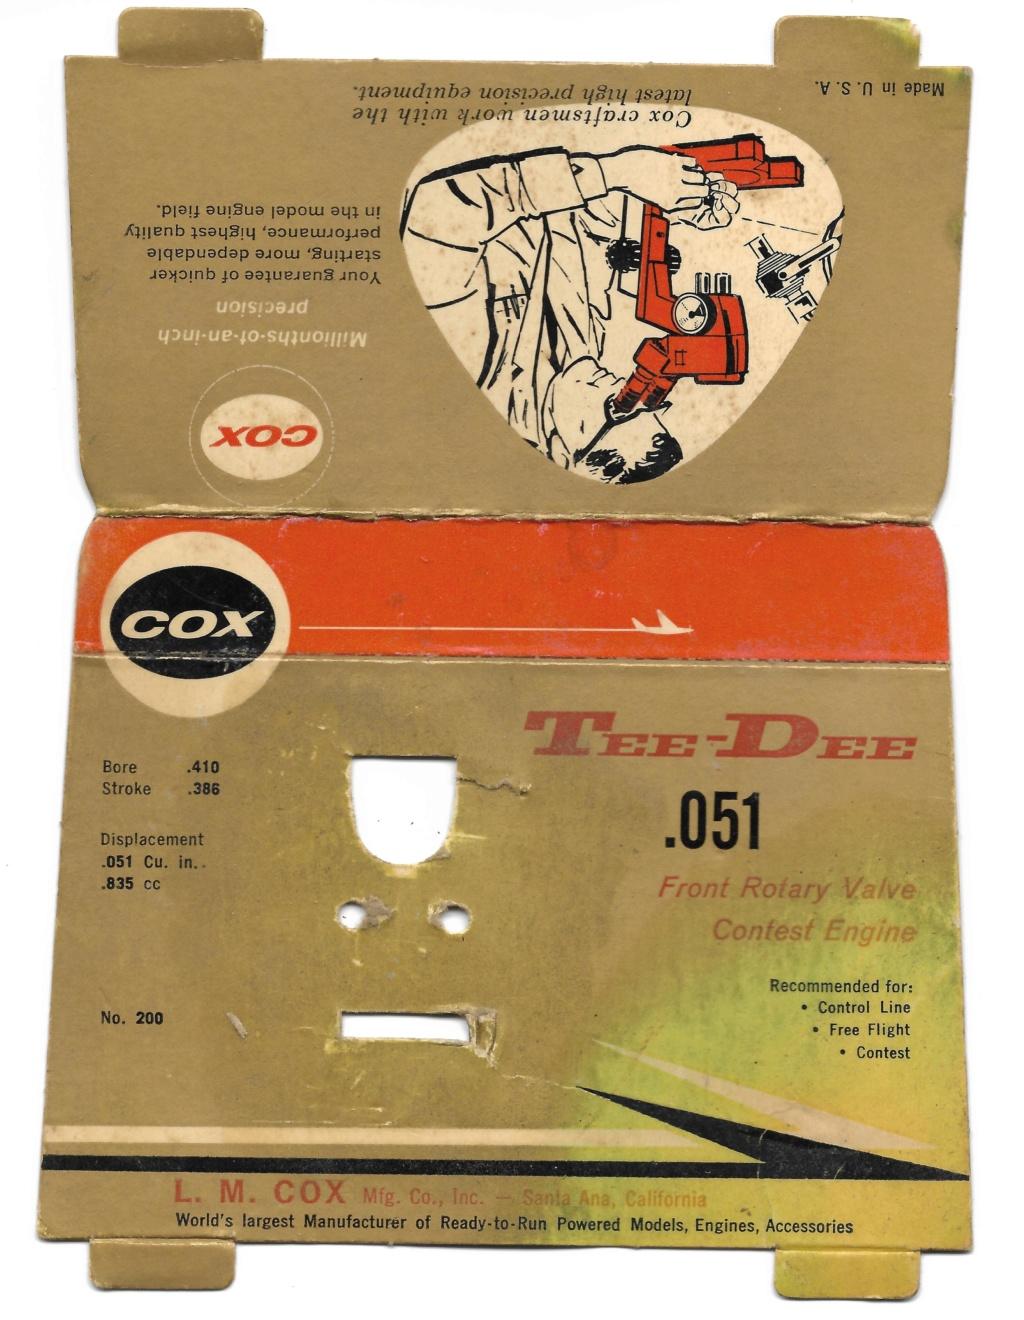 Display Card for Tee Dee .051 0_213